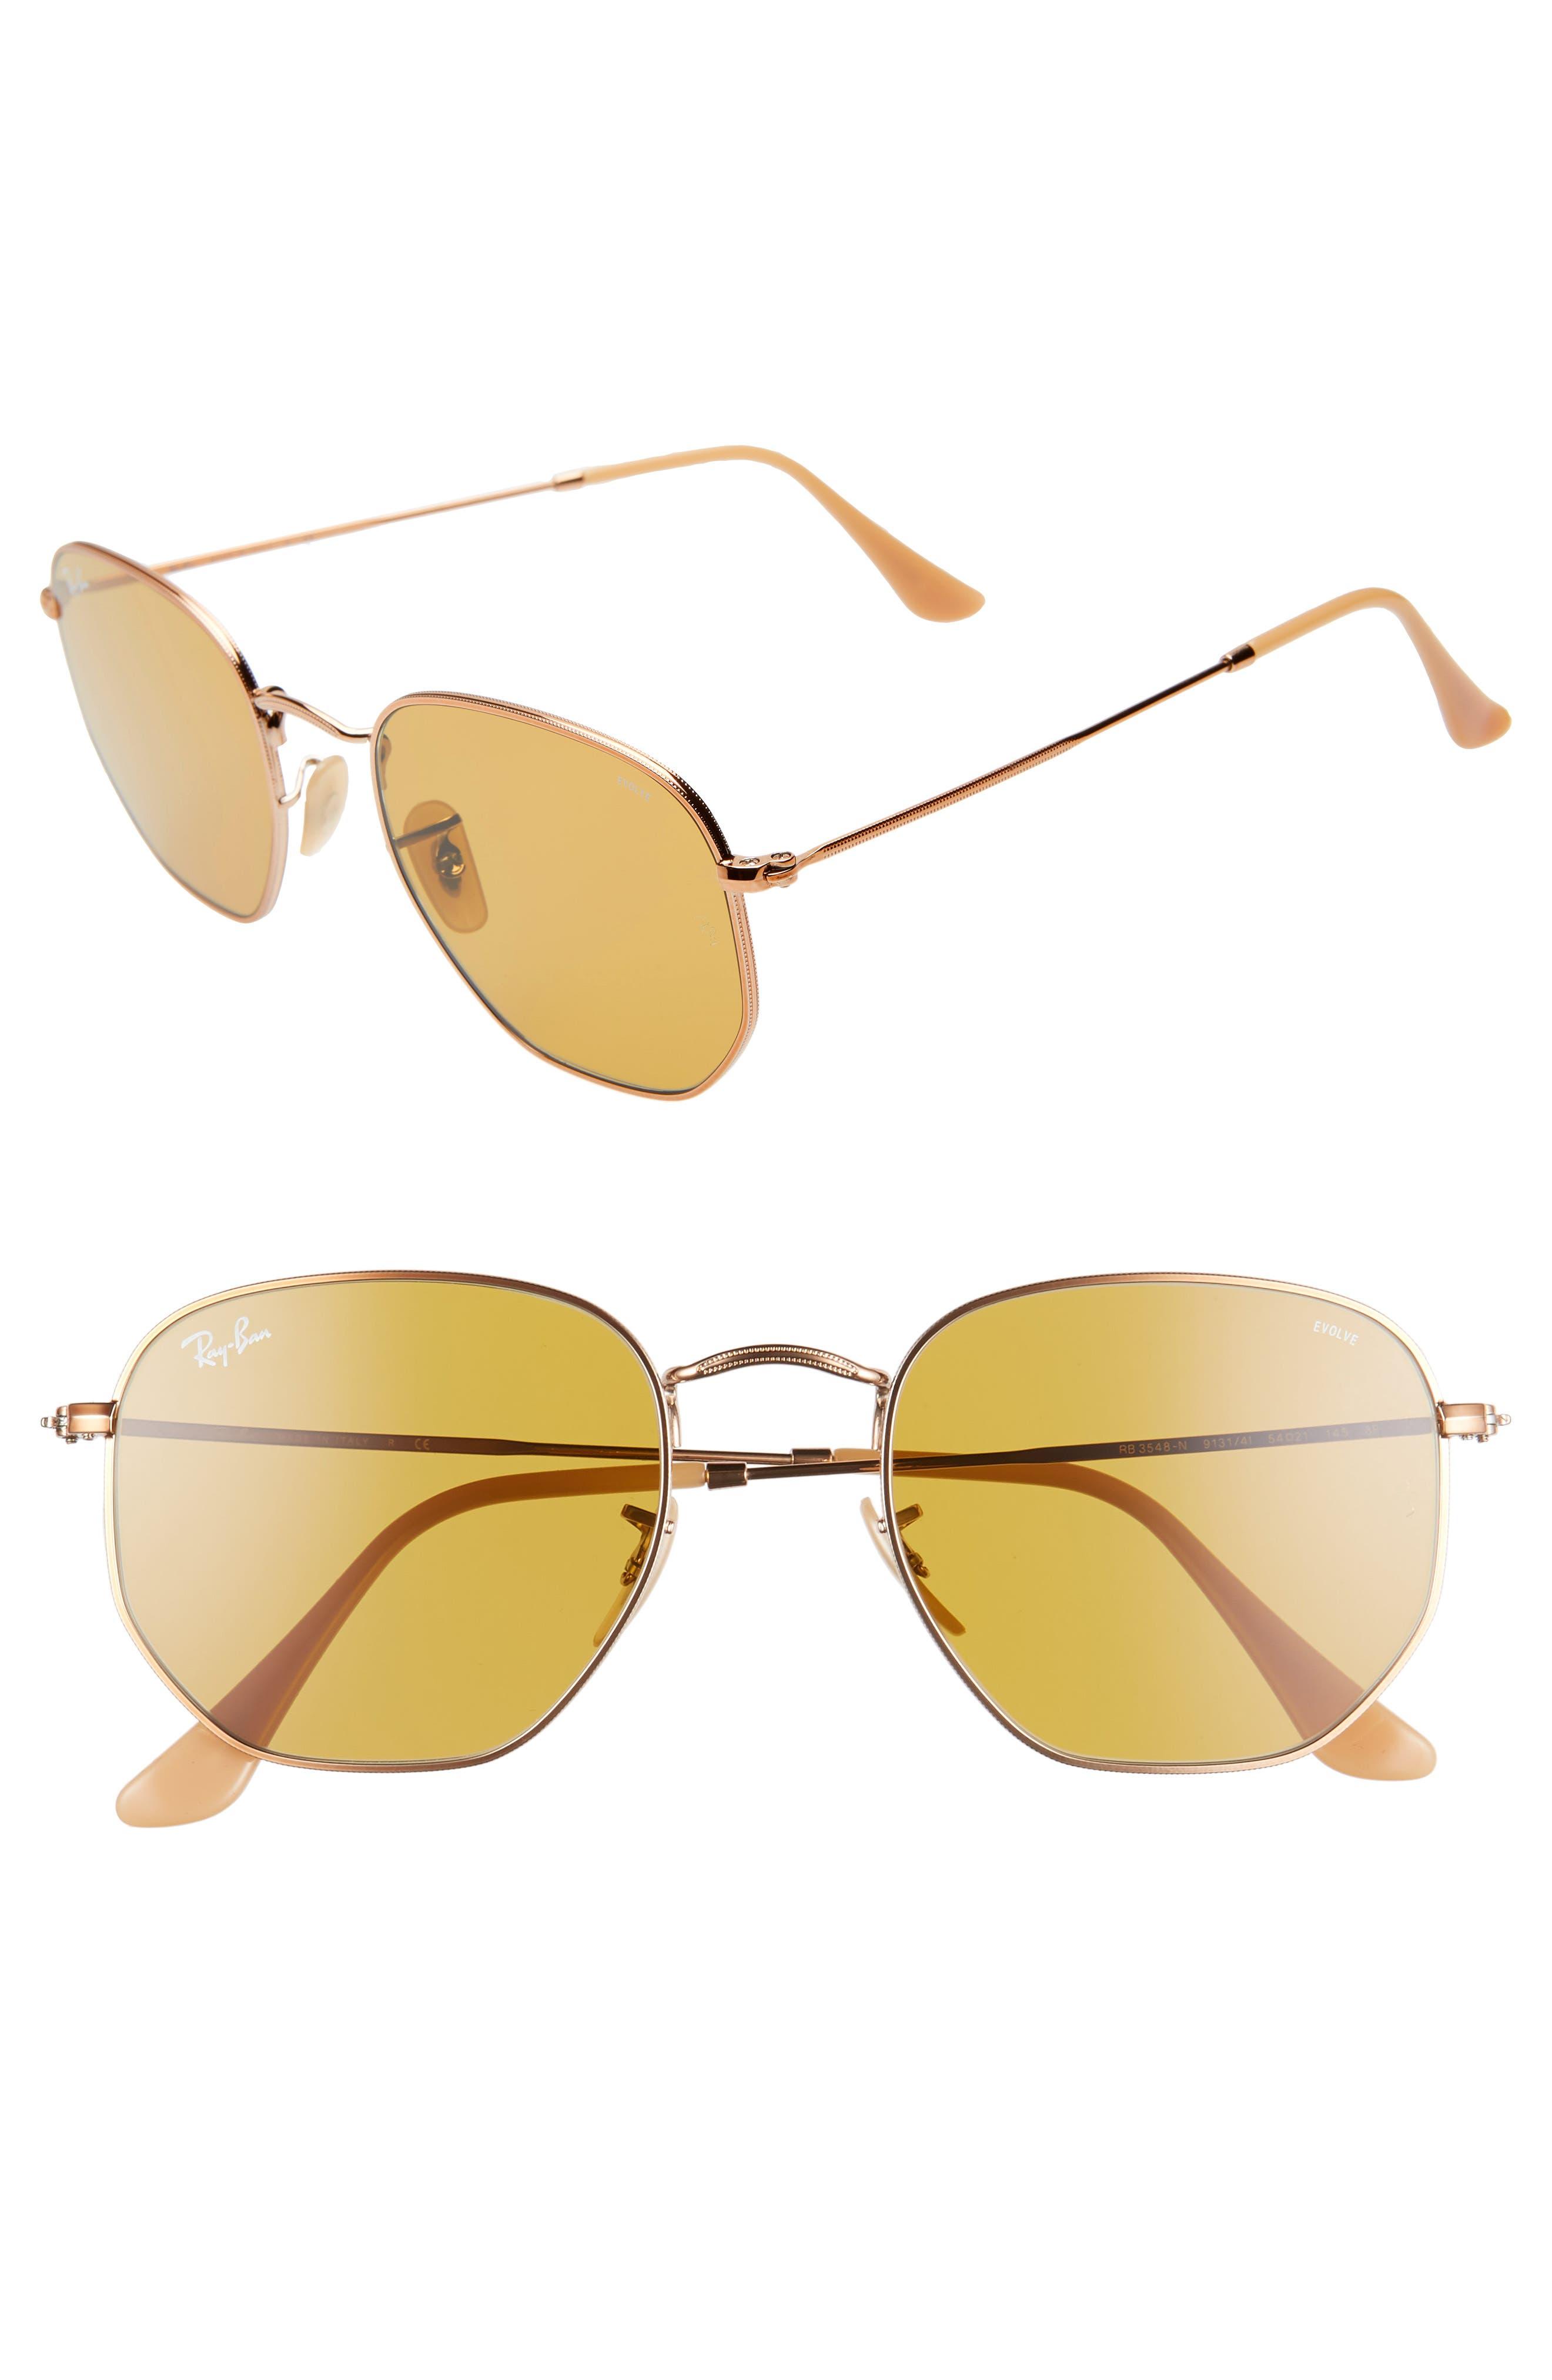 Ray-Ban 5m Evolve Photochromic Hexagon Sunglasses - Gold/ Copper Solid